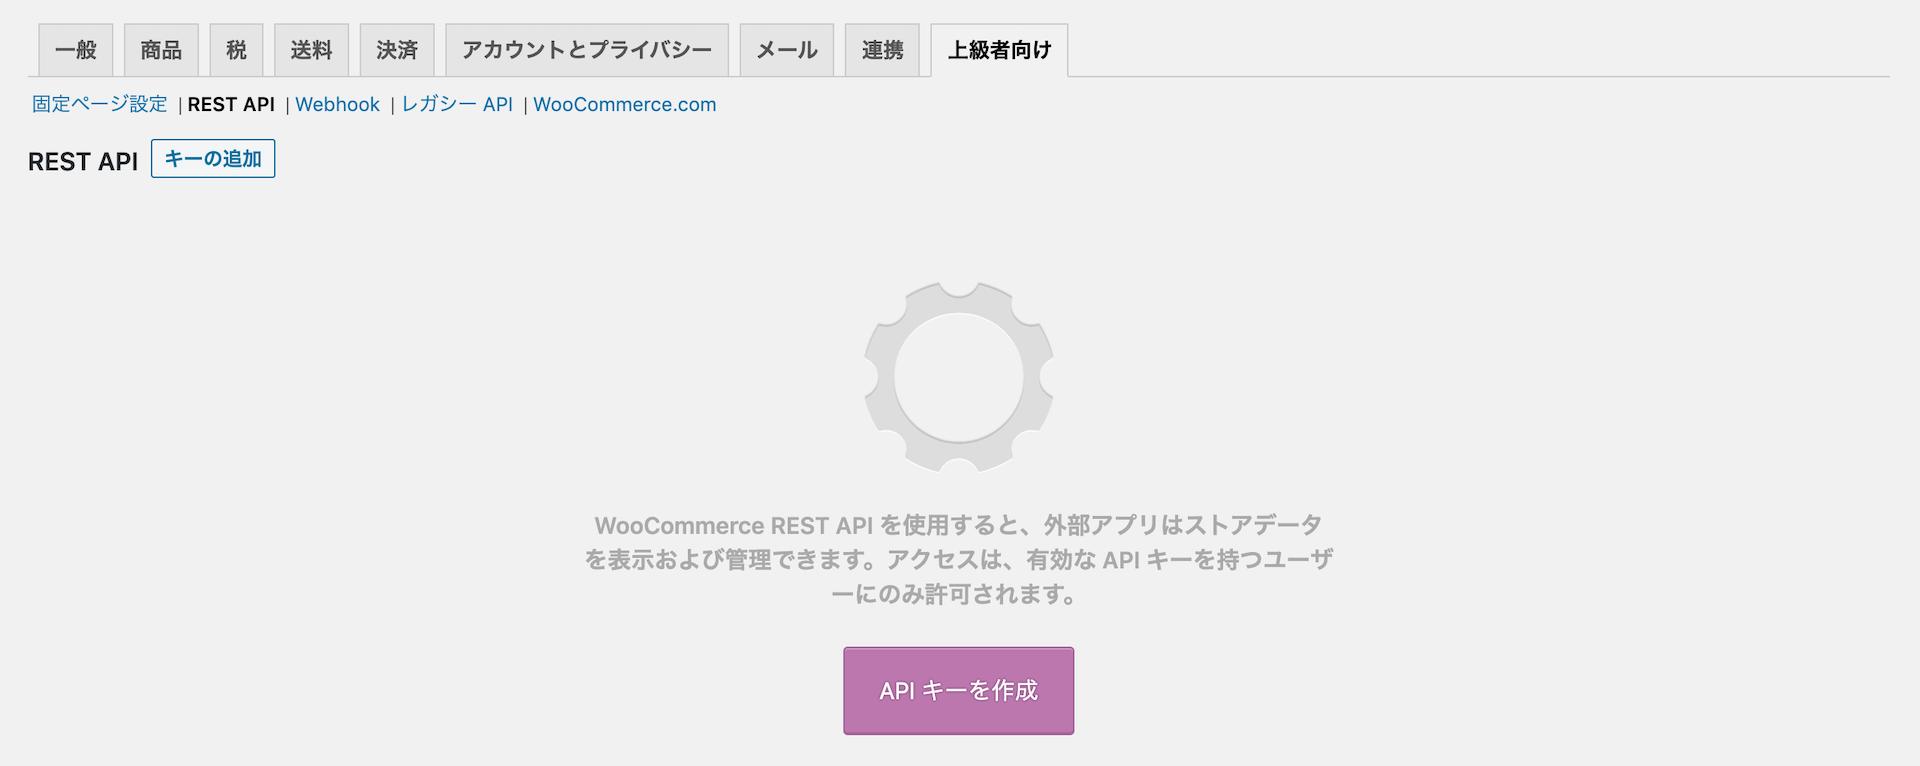 WooCommerce 上級者向けのREST APIの設定